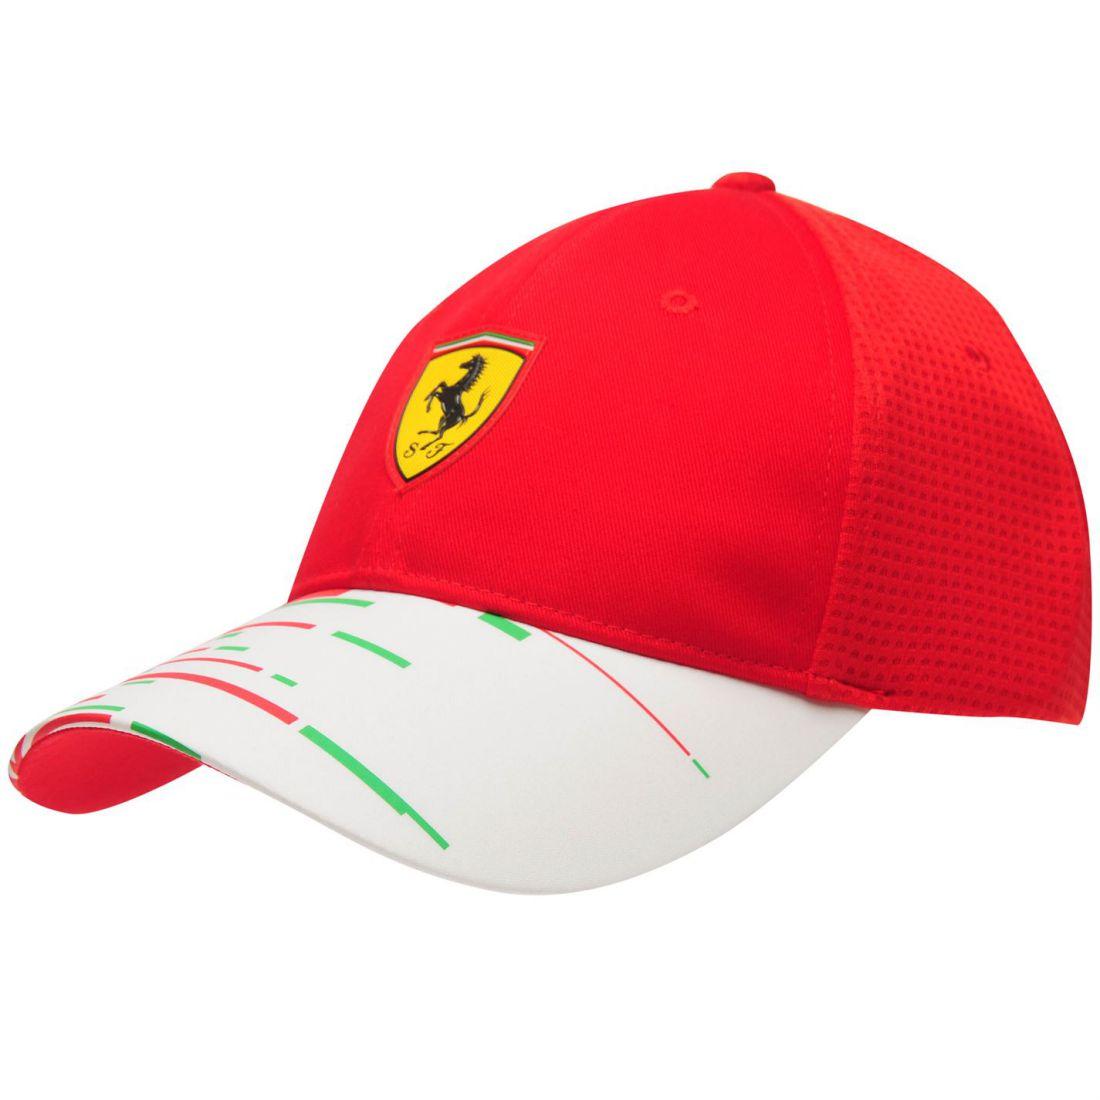 874225aa26c Puma Mens Scuderia Ferrari Team Cap Baseball Cotton Mesh Breathability